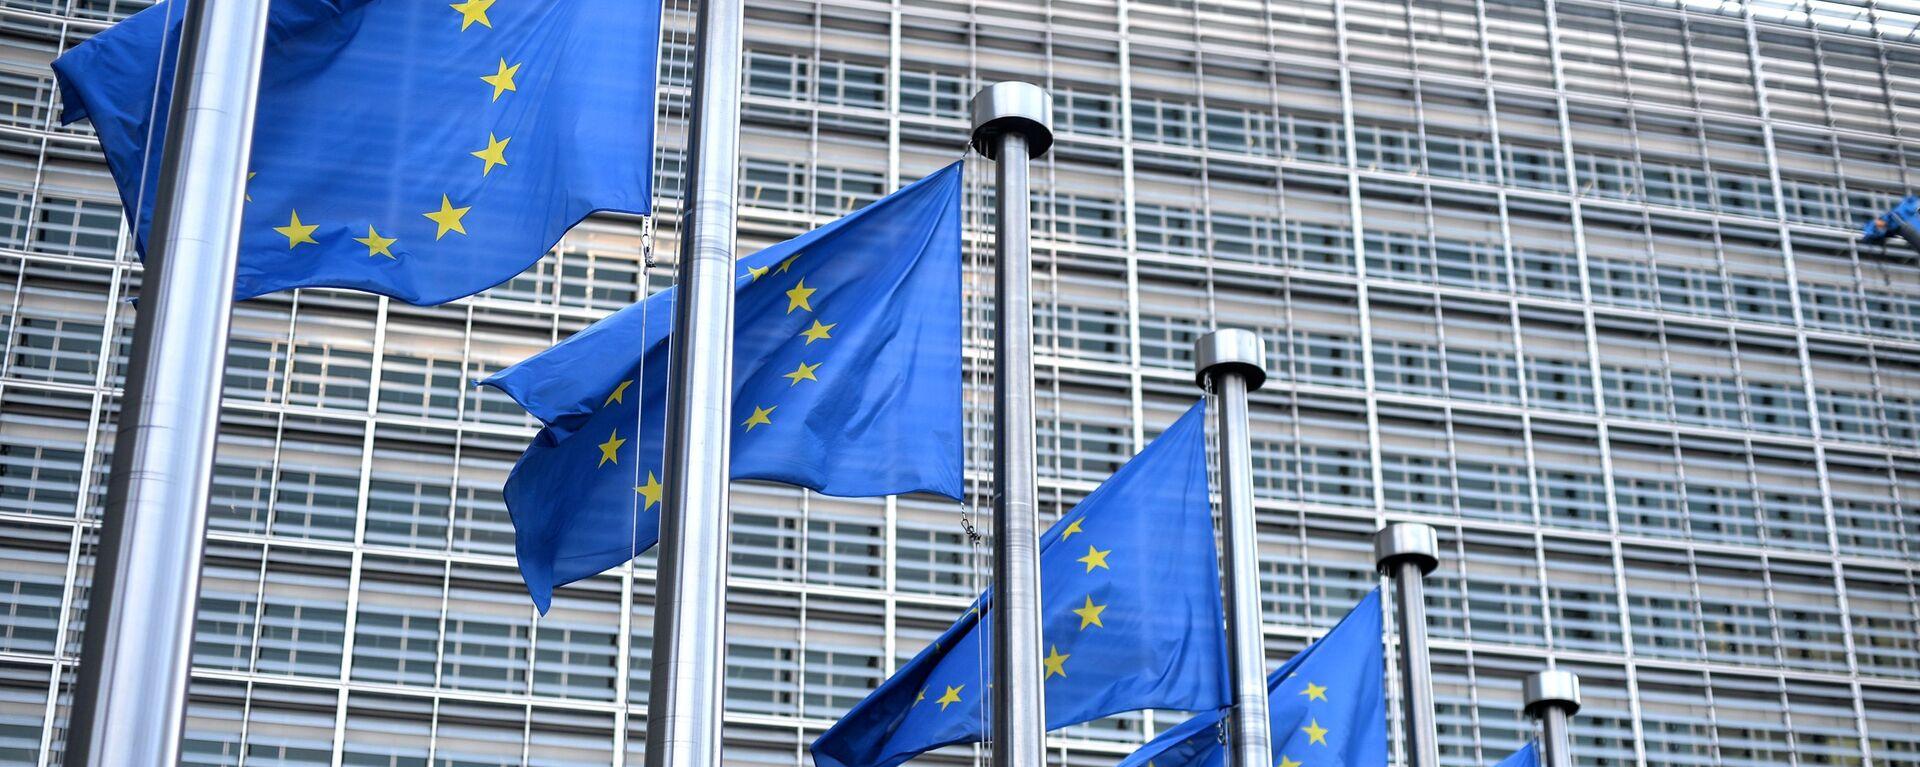 Bandiera UE - Sputnik Italia, 1920, 09.08.2021